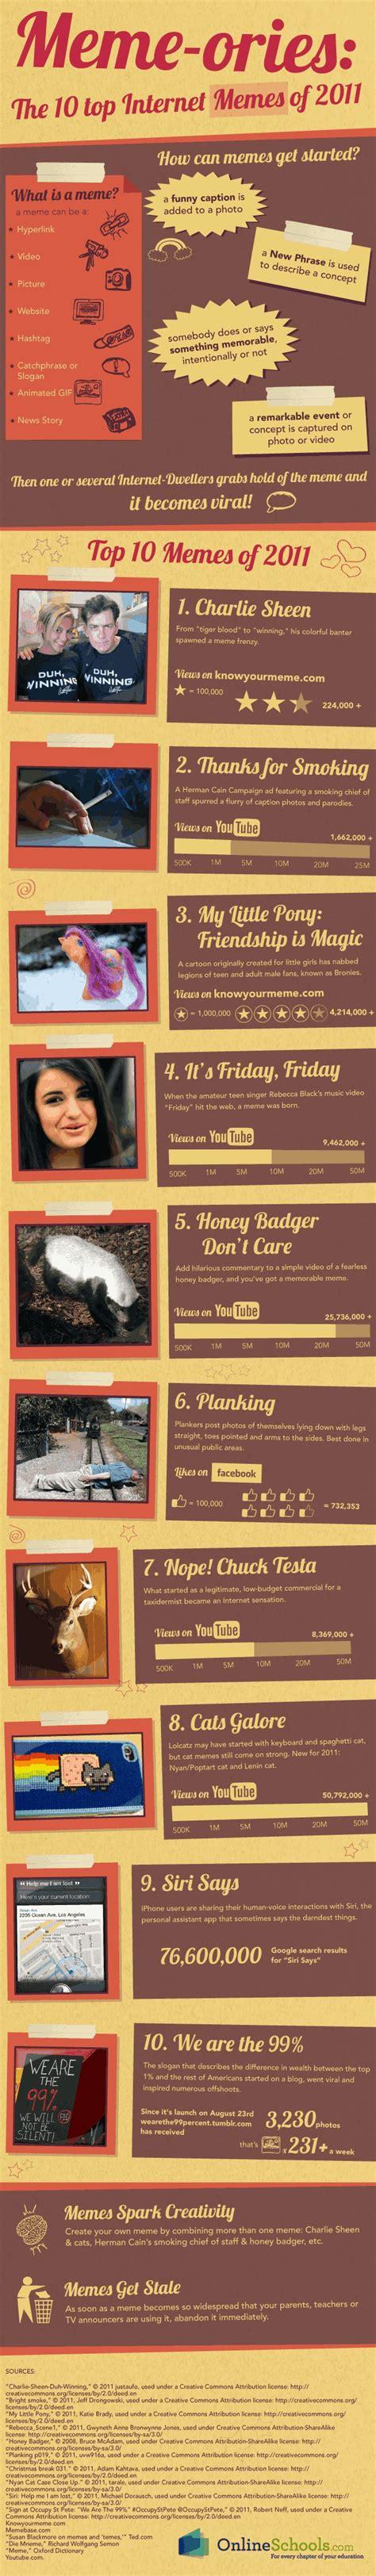 Best Memes Of 2011 - infographic top internet memes of 2011 memeories